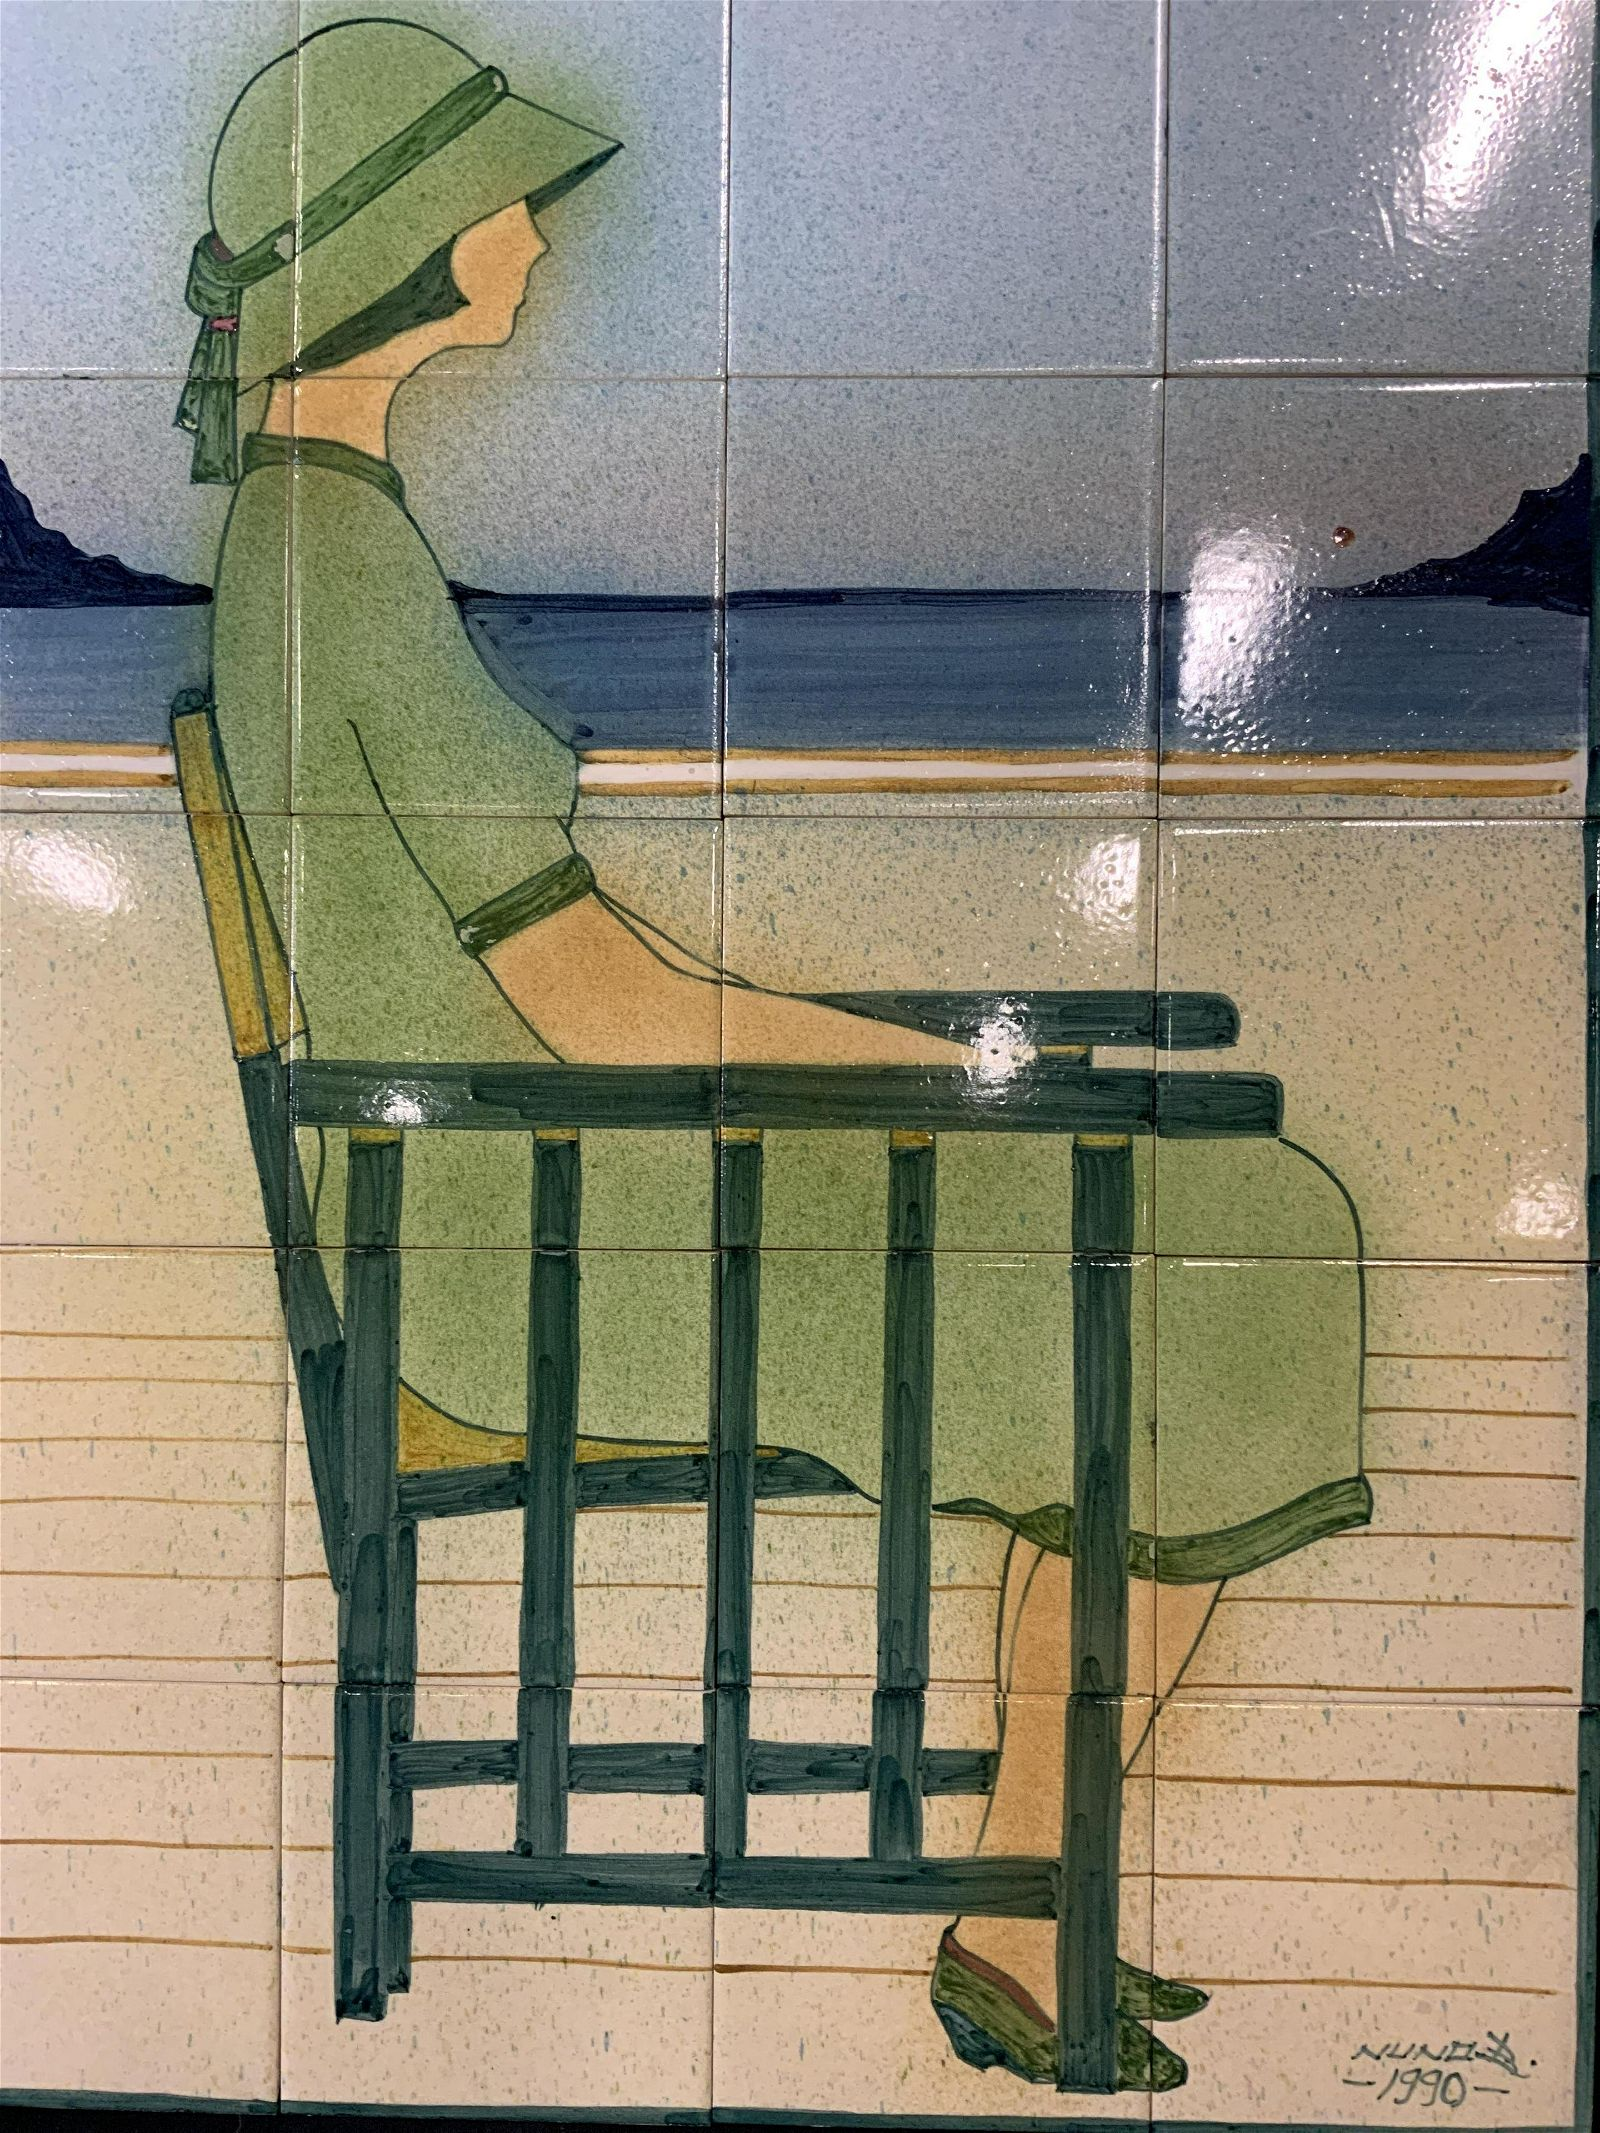 NUNO B Signed Painted Ceramic Tile Portrait Art